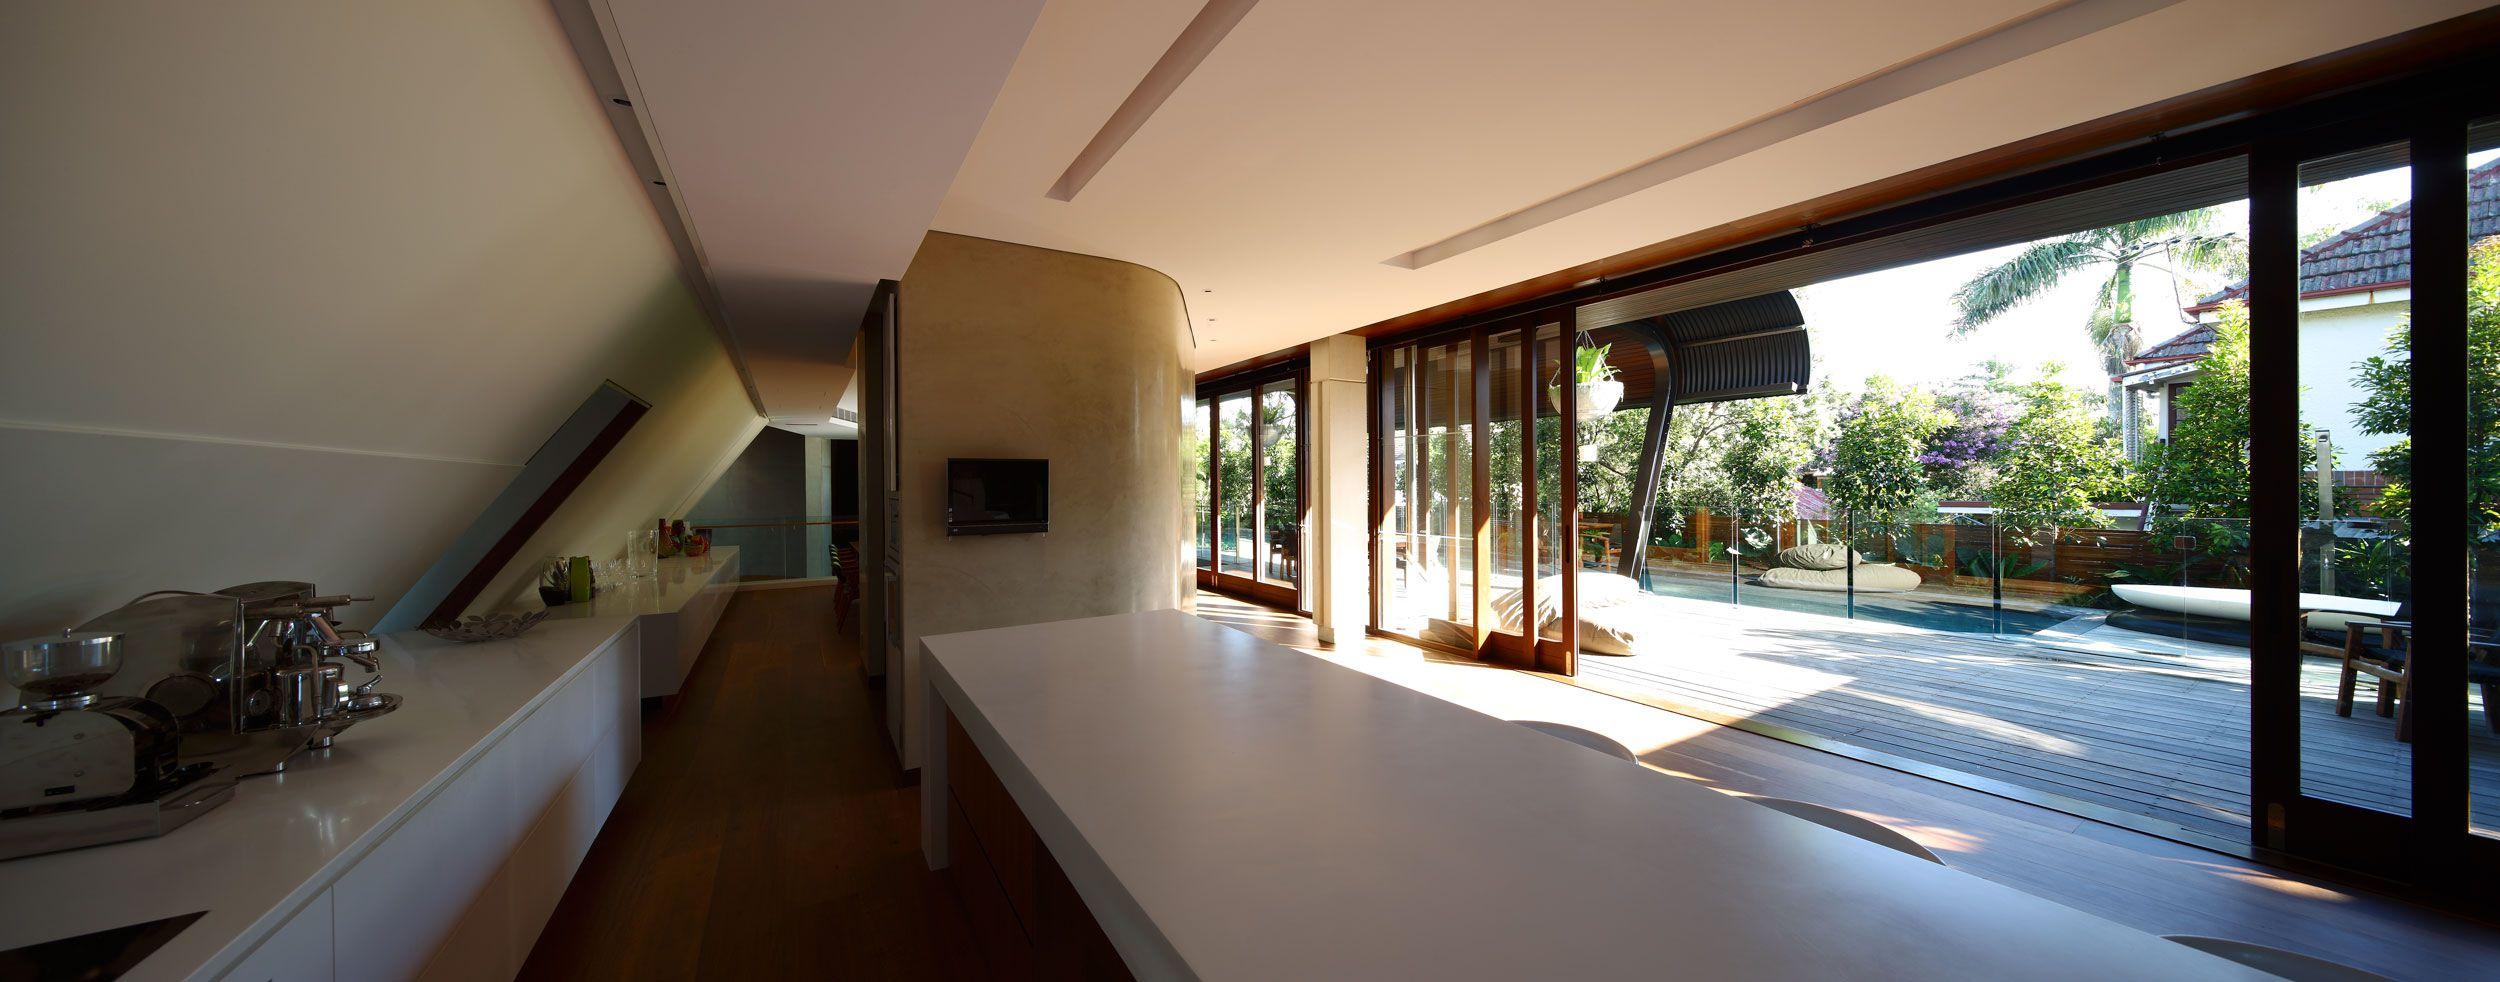 Oxlade-House-08-2